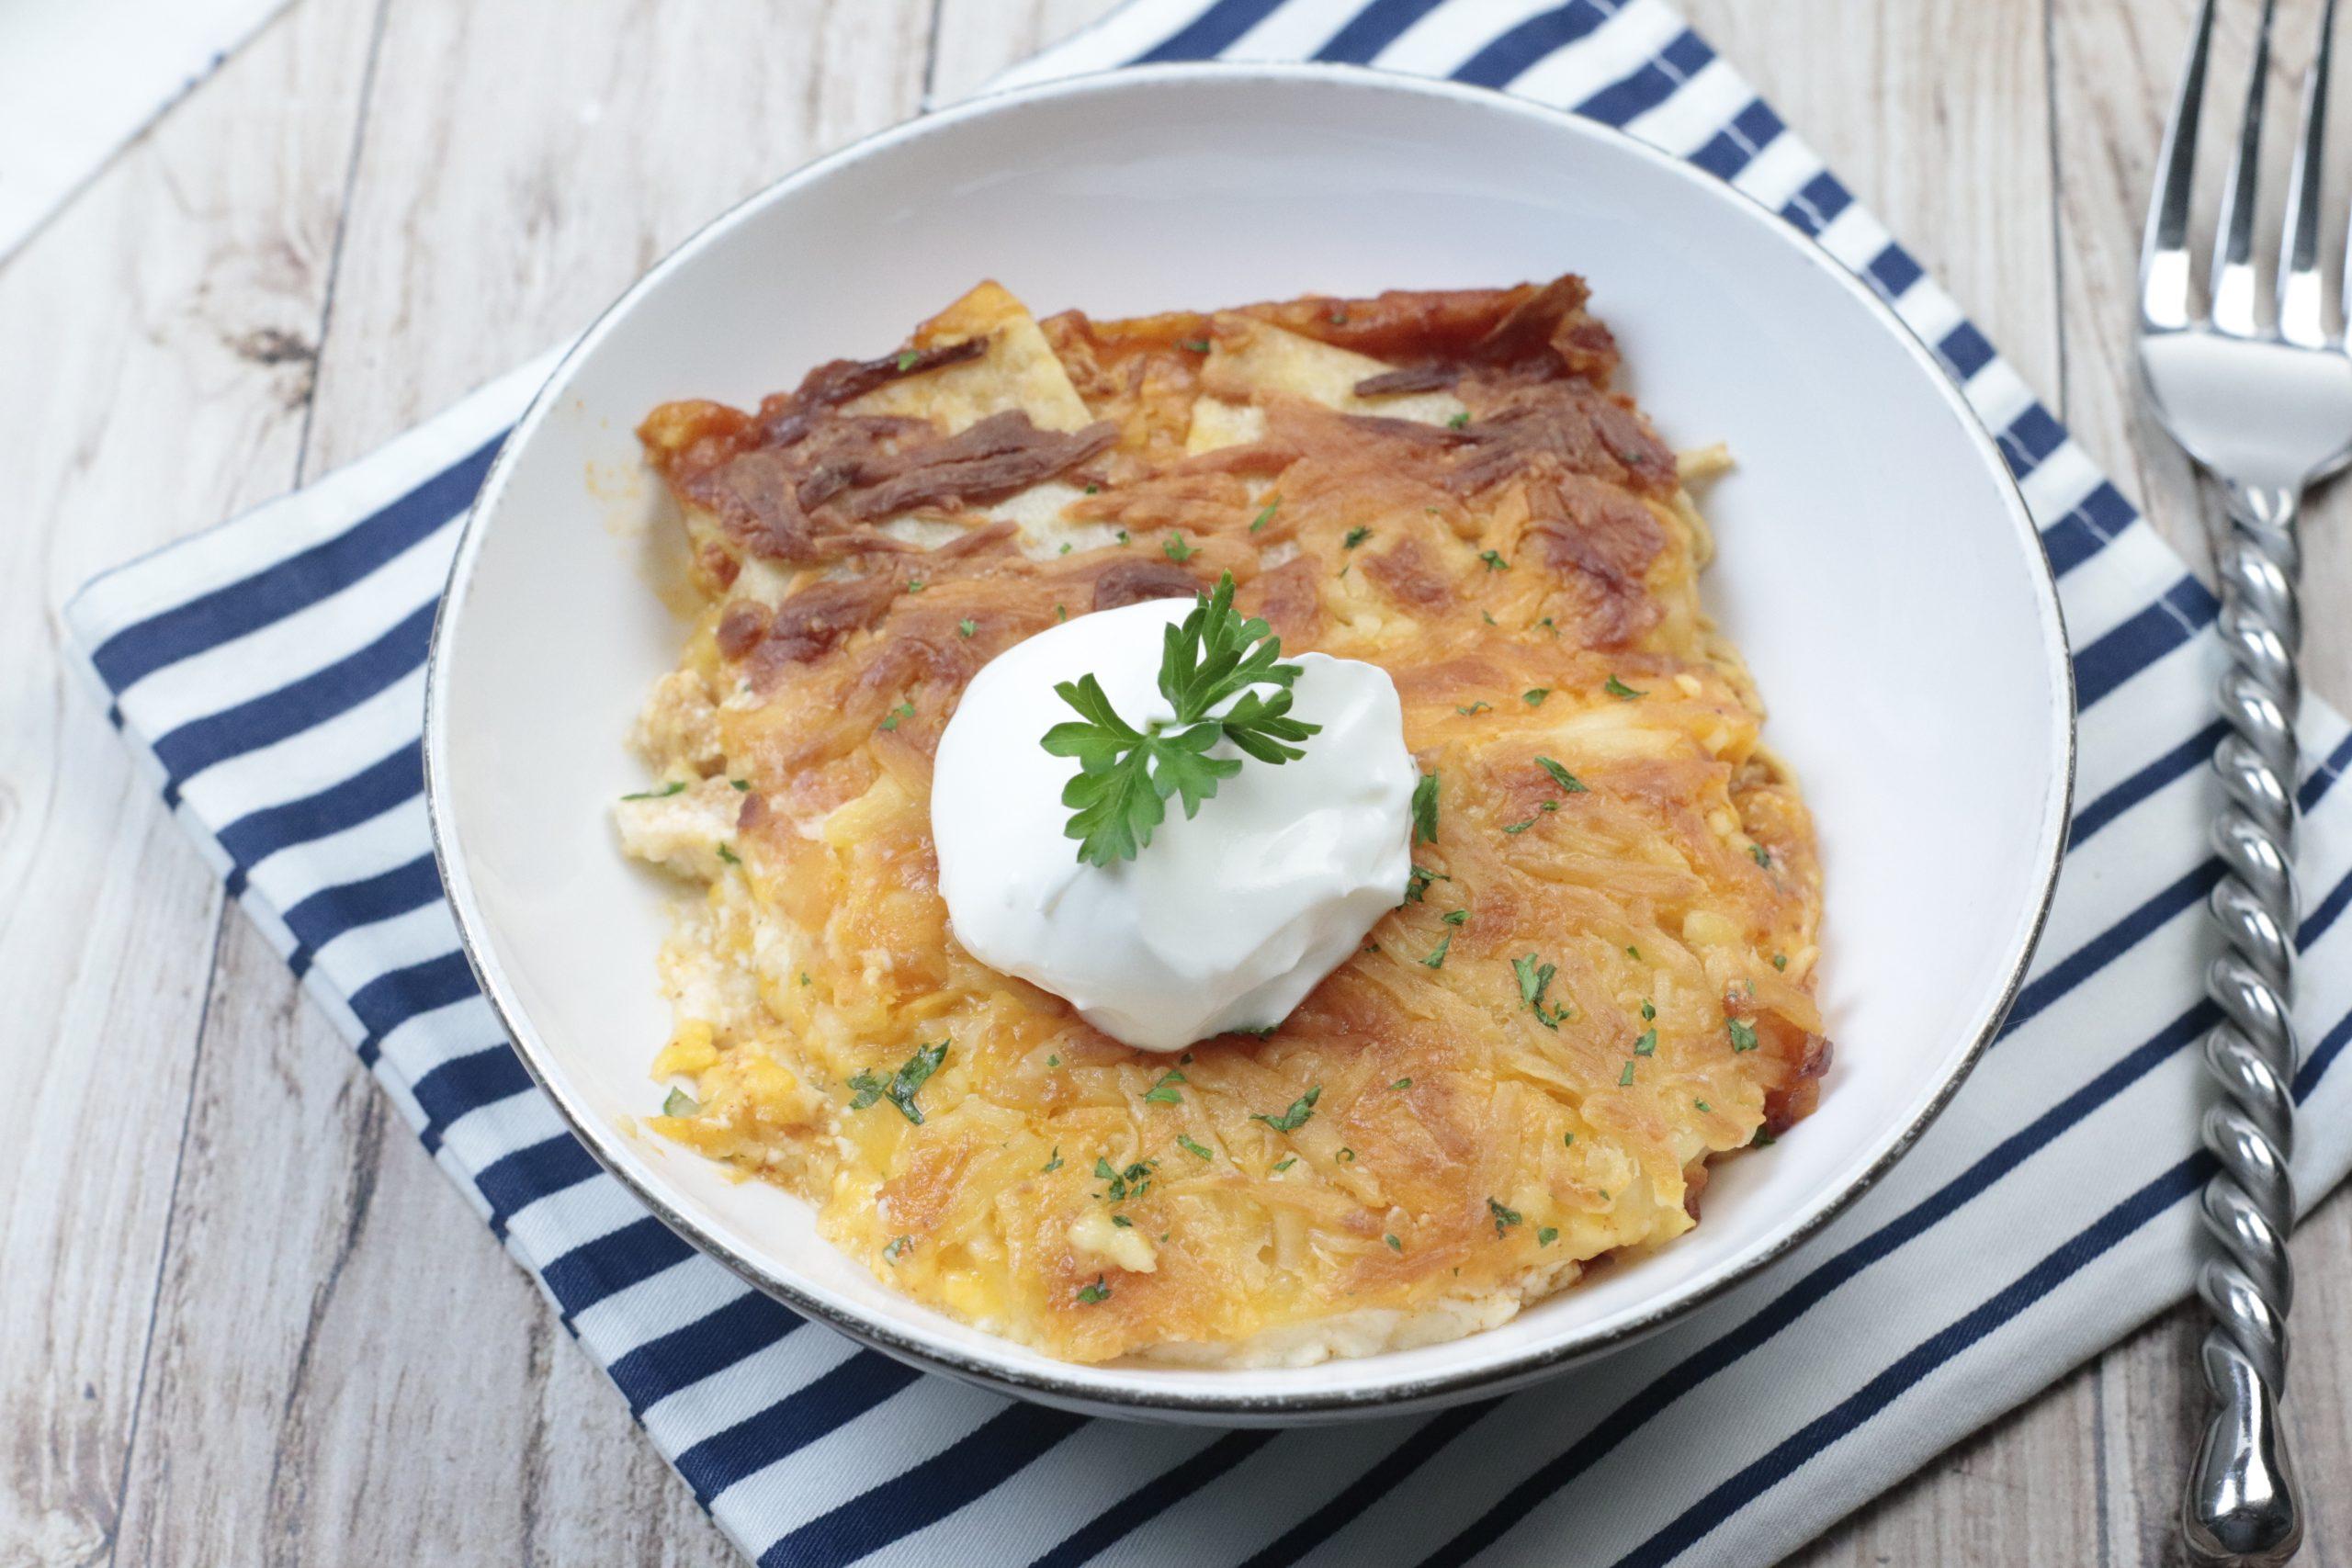 Rotisserie Chicken Enchilada Casserole in a white bowl with a dollop of sour cream